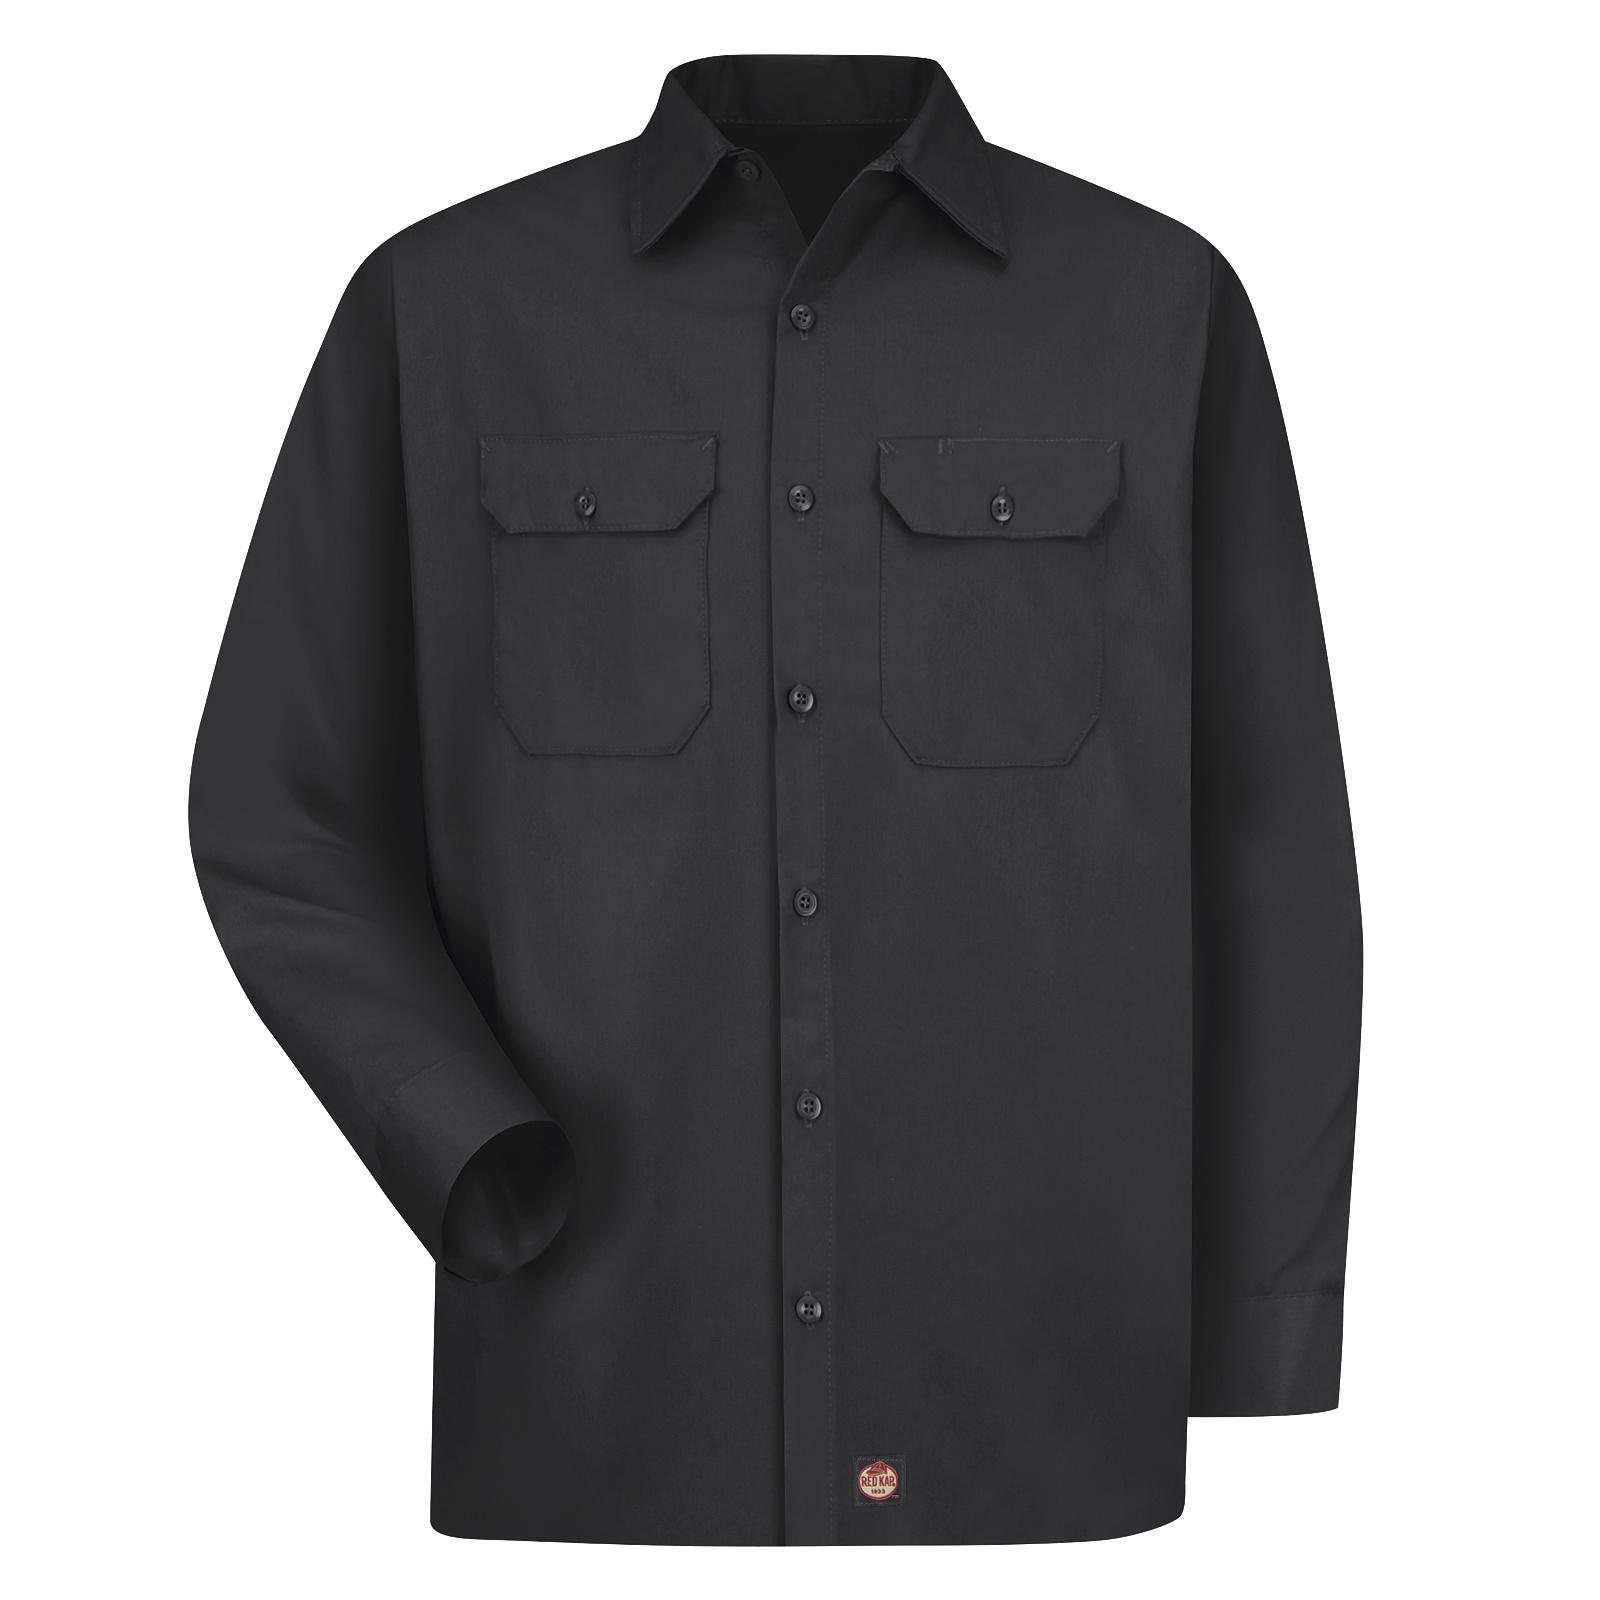 LEE Men's Utility Uniform Shirt PartNumber: 3ZZVA96498212P MfgPartNumber: ST52